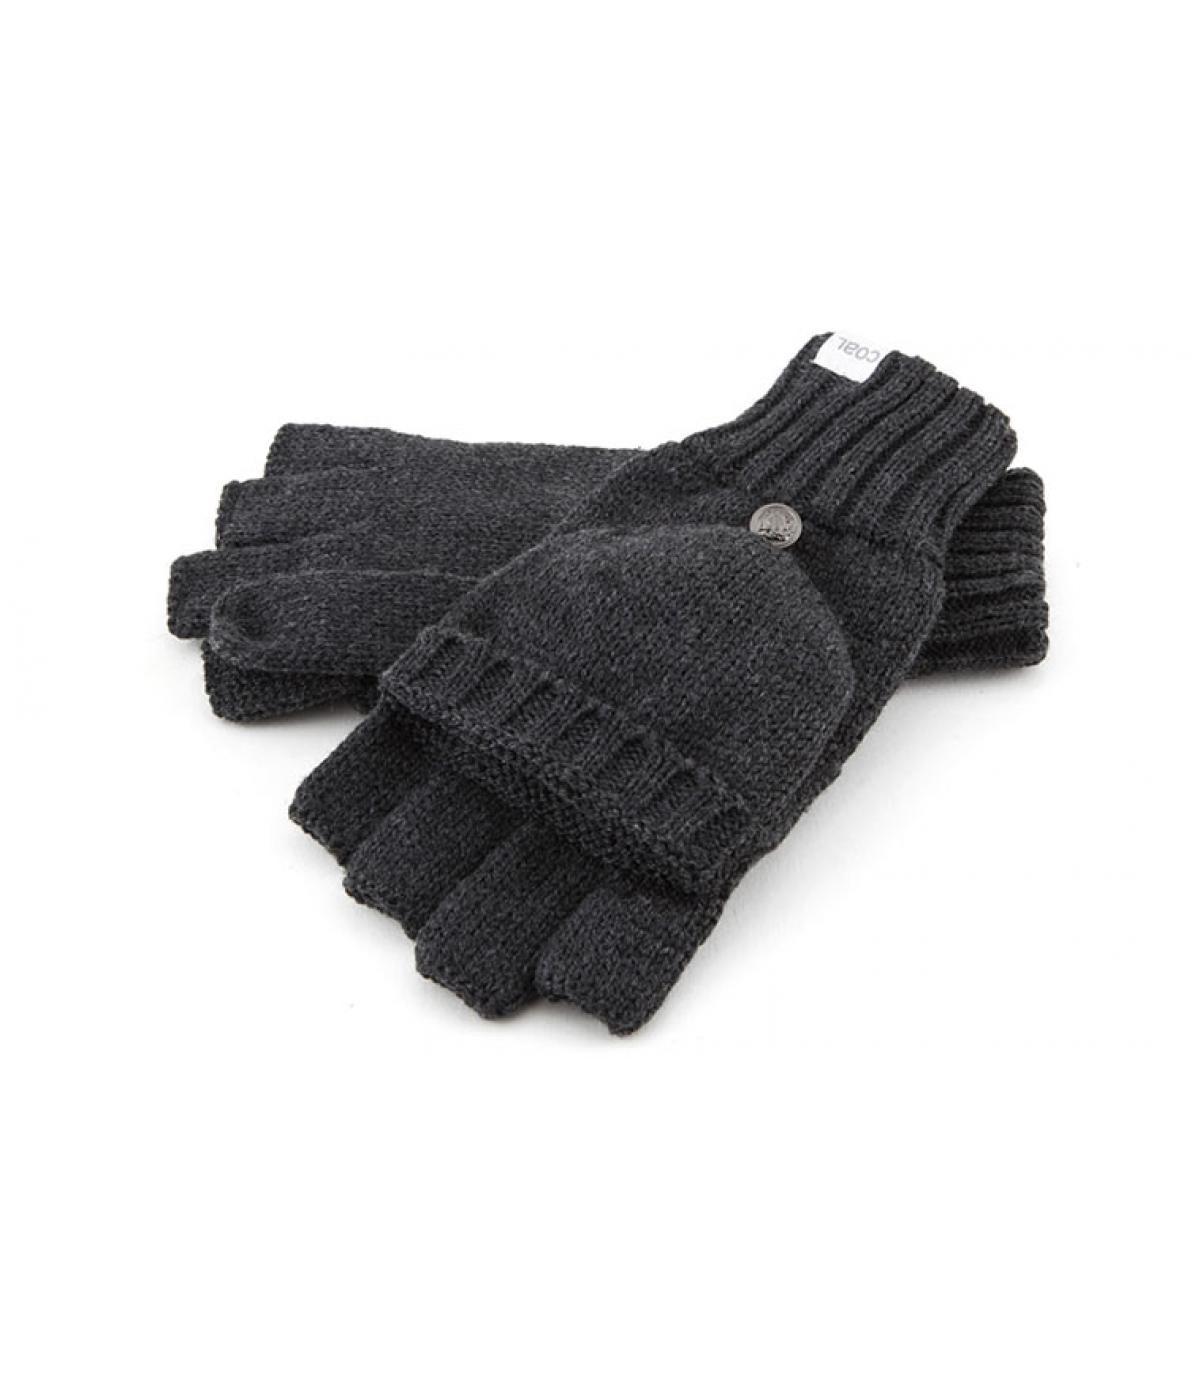 Handschuhe Fäustlinge grau